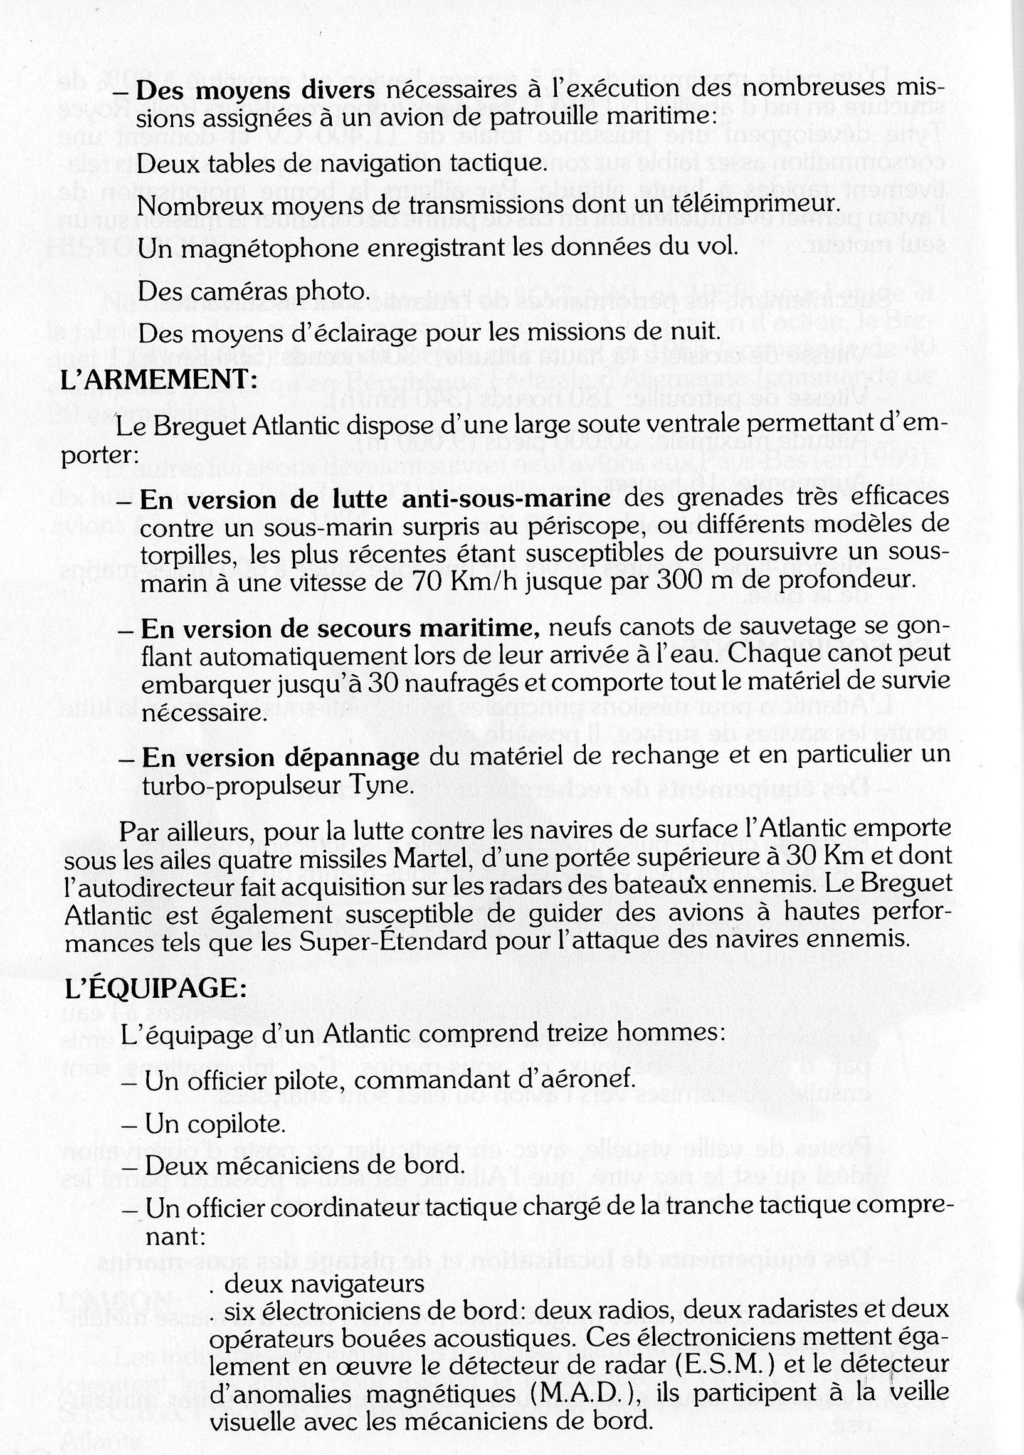 [LES B.A.N.] NÎMES GARONS - Page 4 Img67910